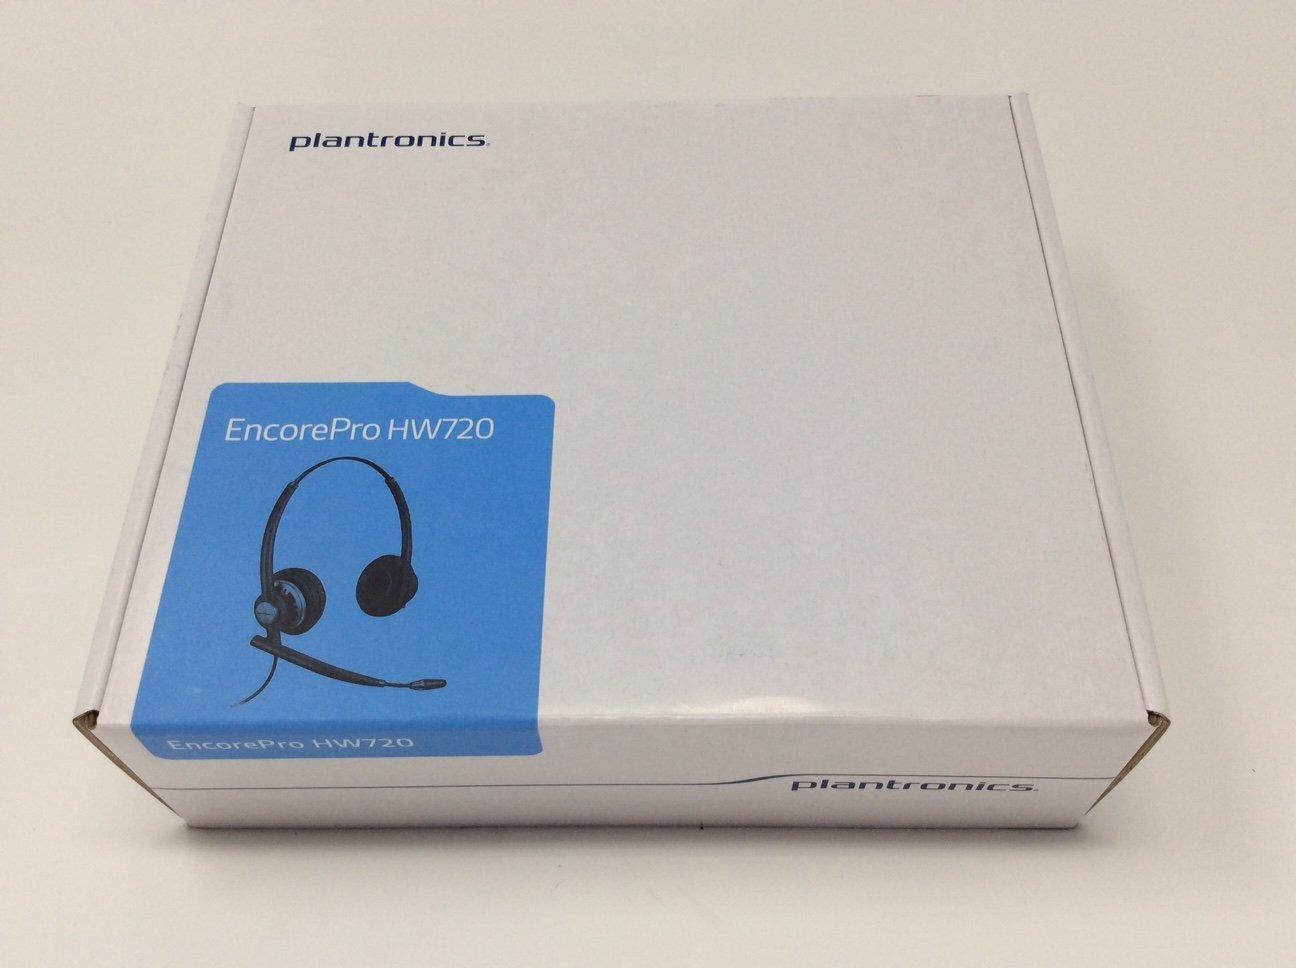 Amazon.com: Plantronics EncorePro HW720 Customer Service Headset (Certified  Refurbished): Electronics